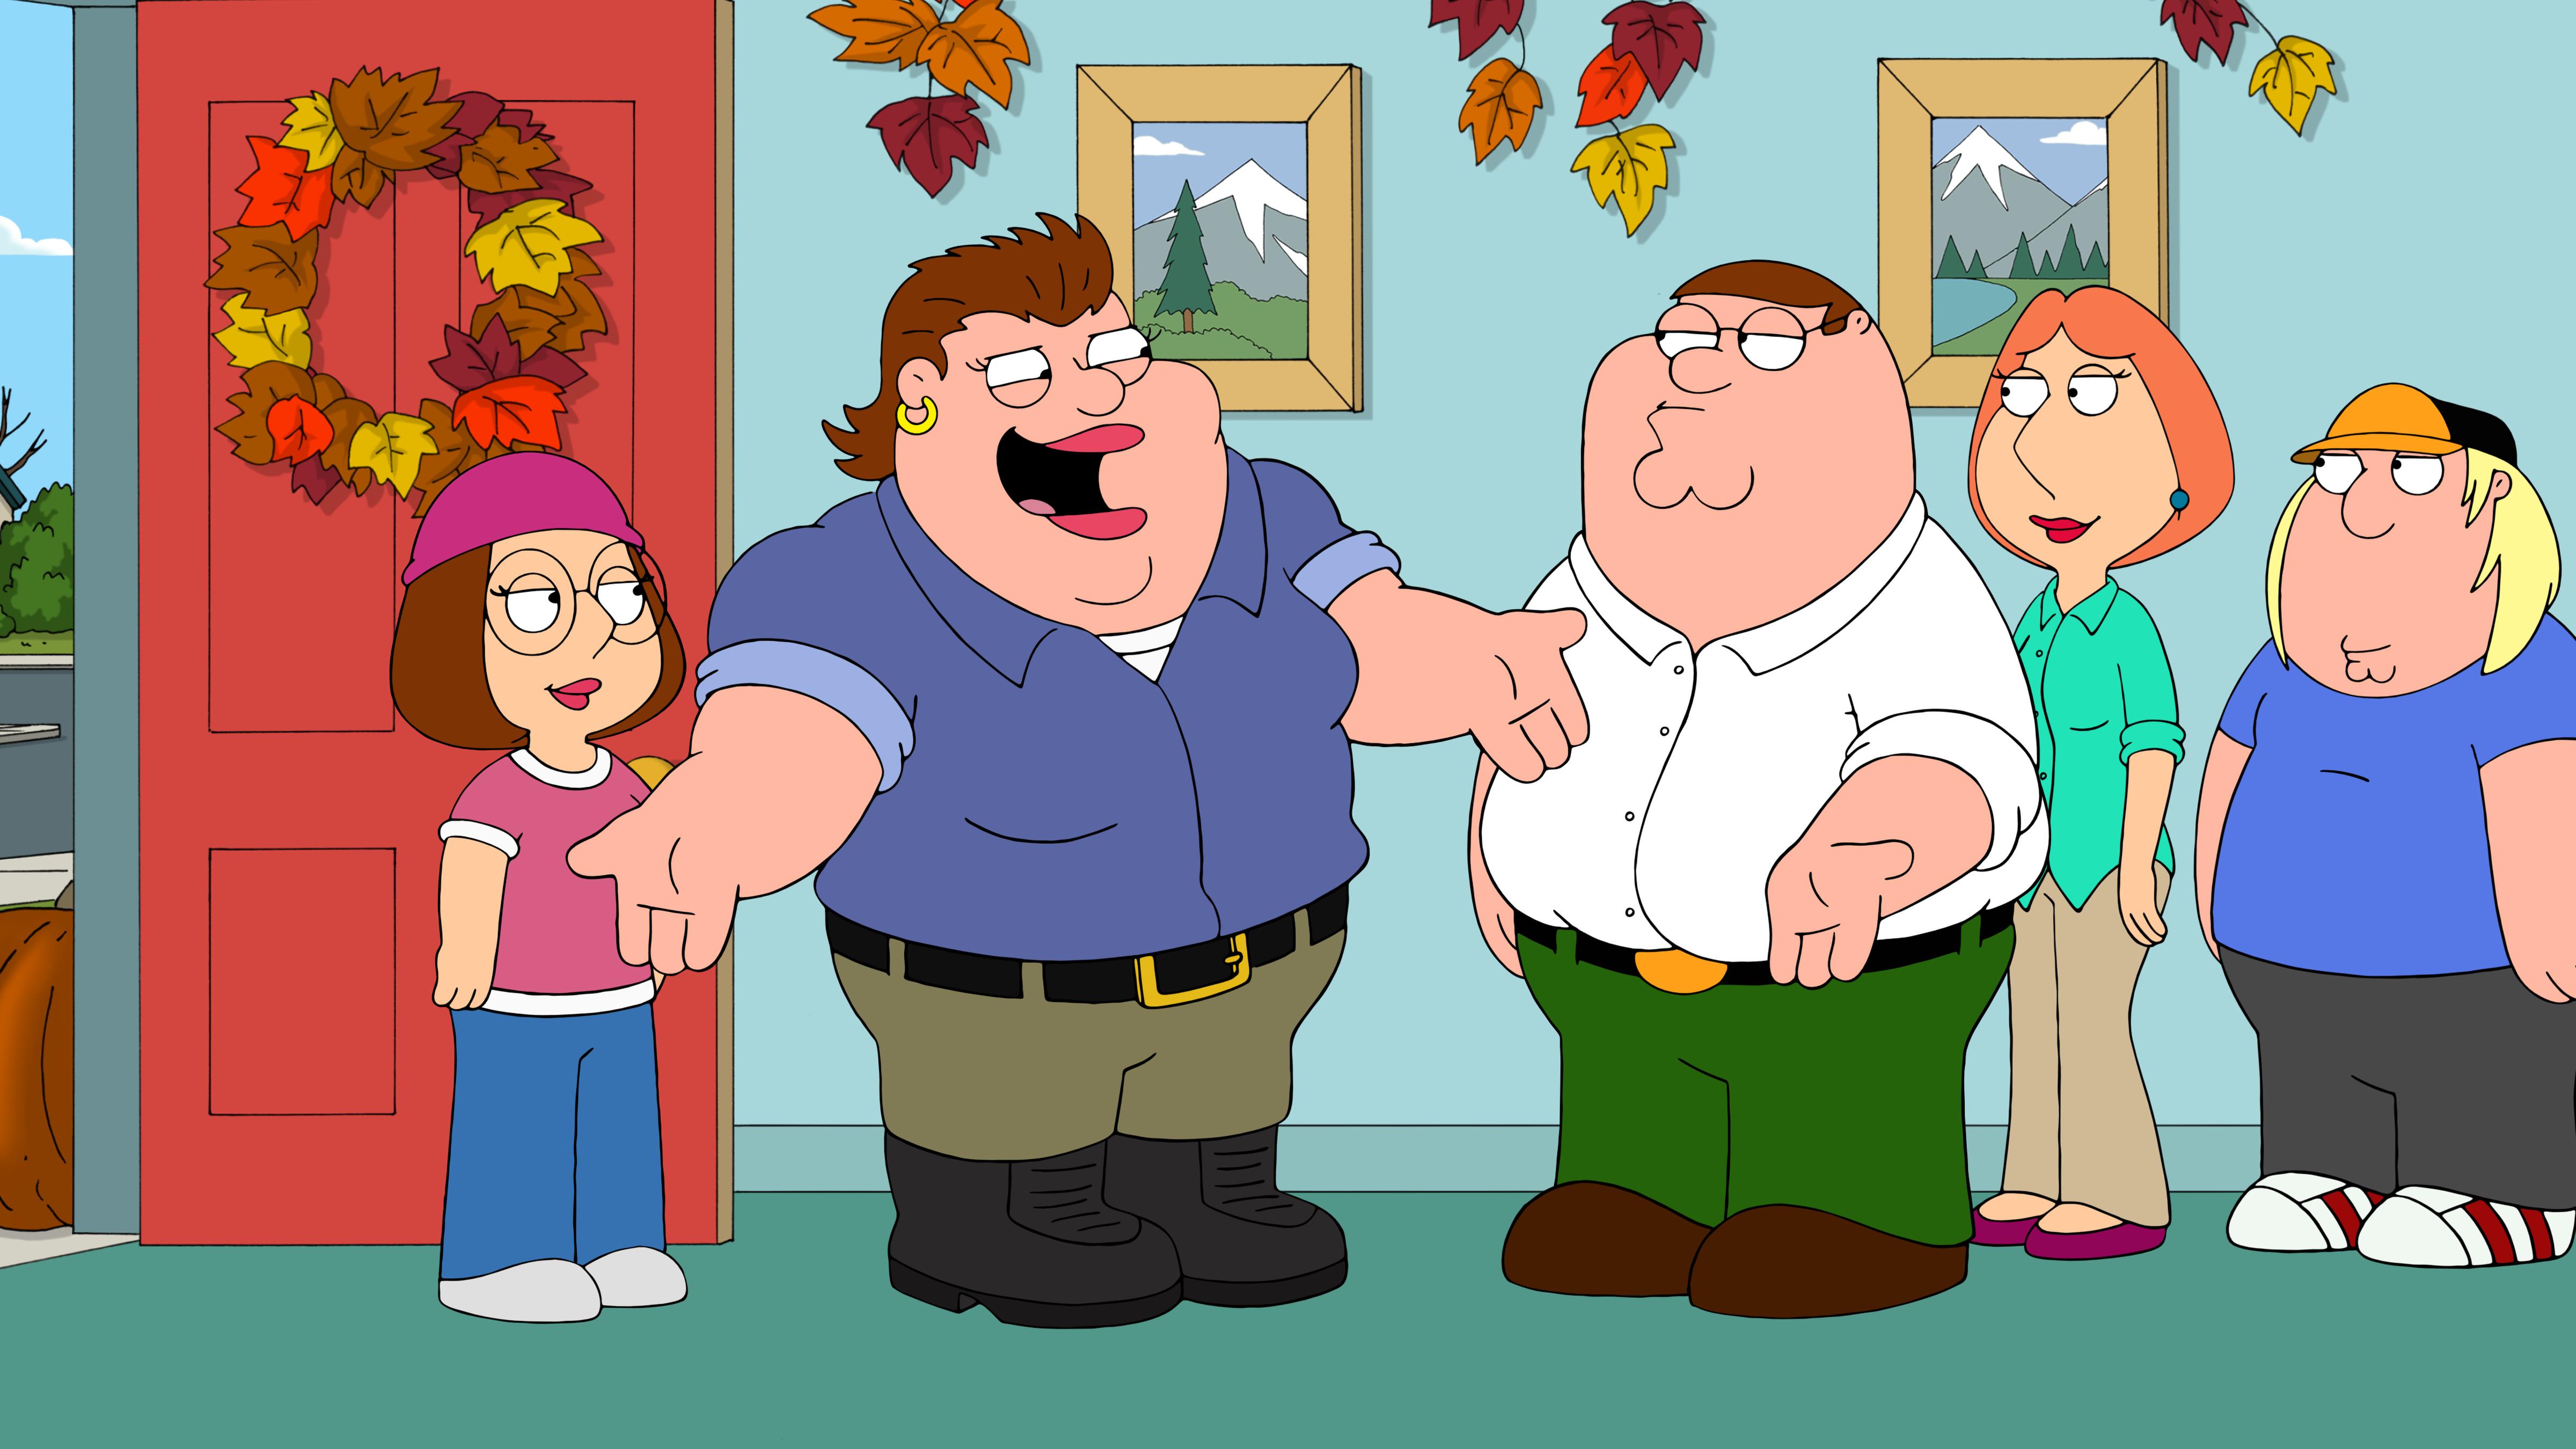 peter's sister | family guy wiki | fandom poweredwikia